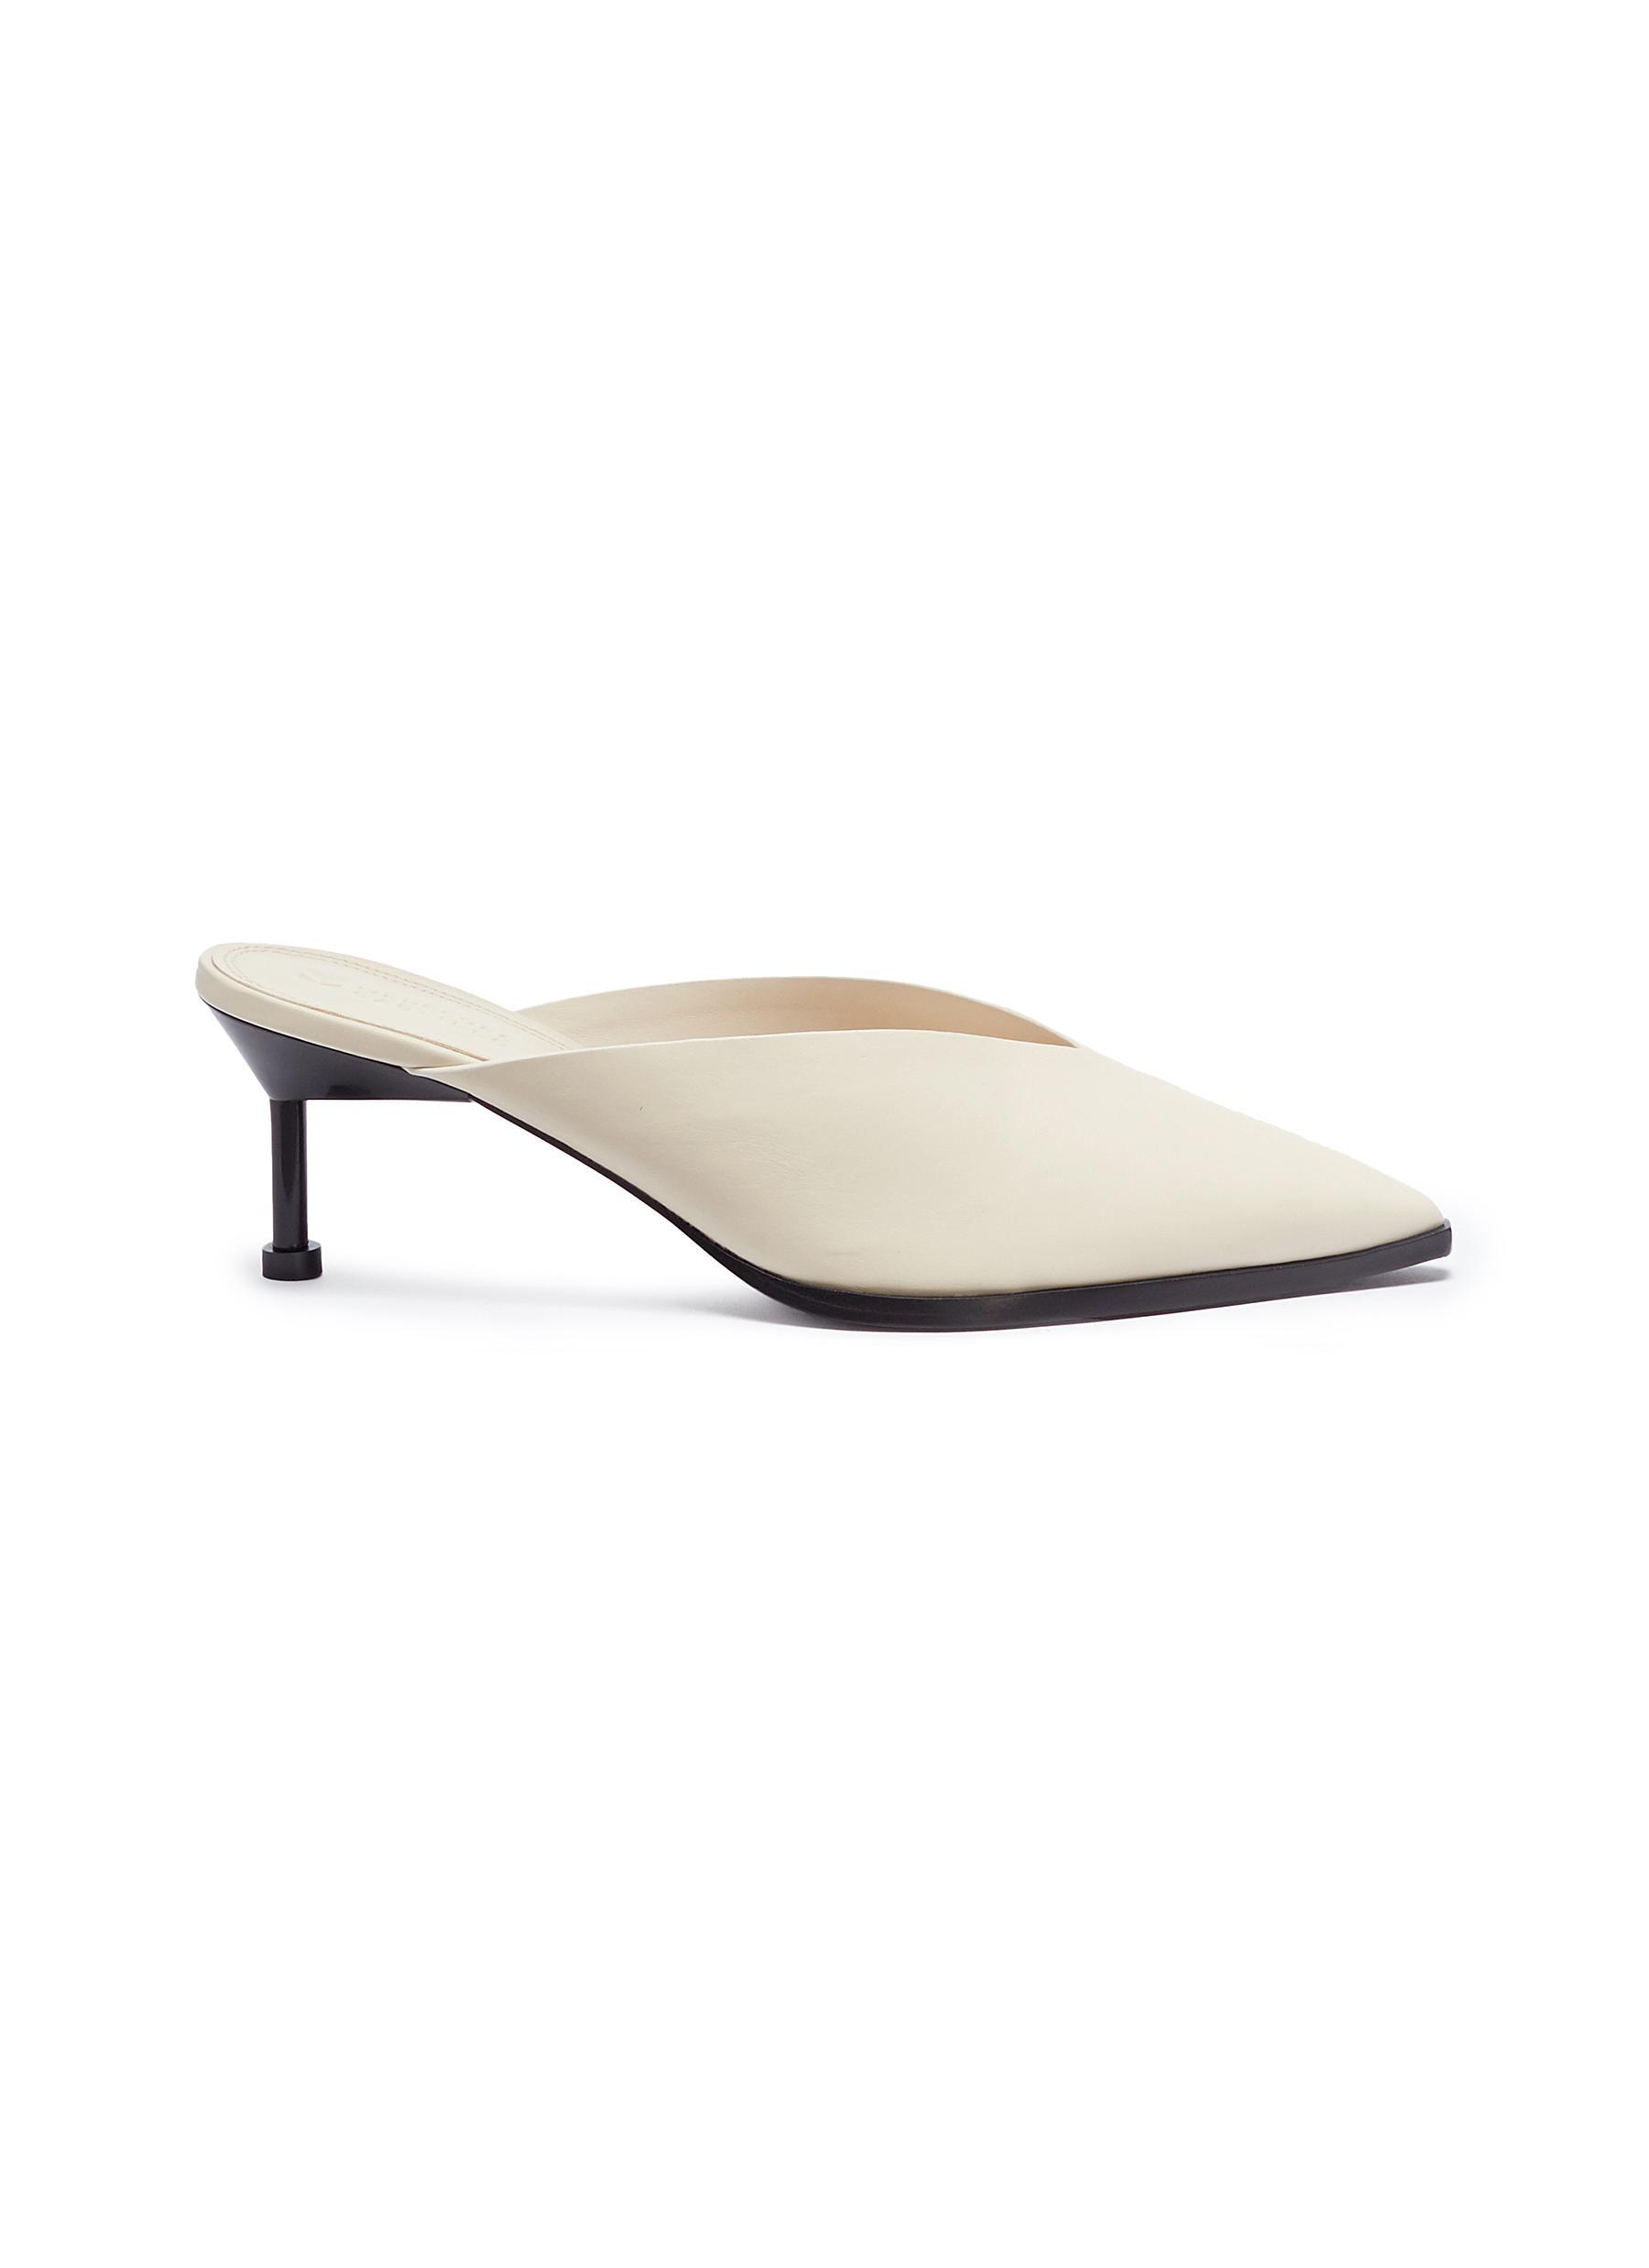 Noriko leather mules by Mercedes Castillo